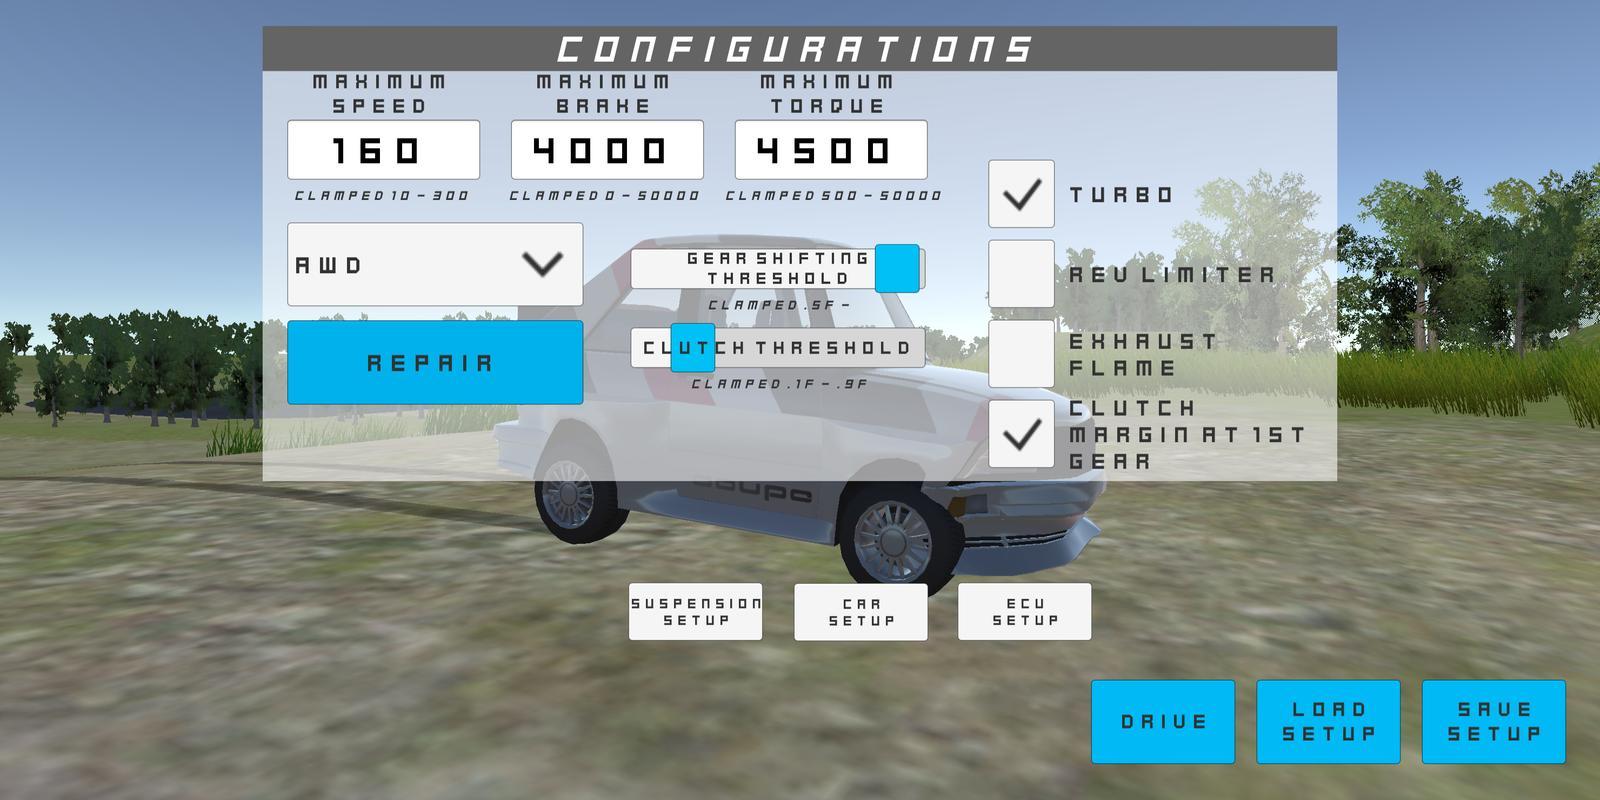 ... Rally Car - Dirt Playground screenshot 3 ...